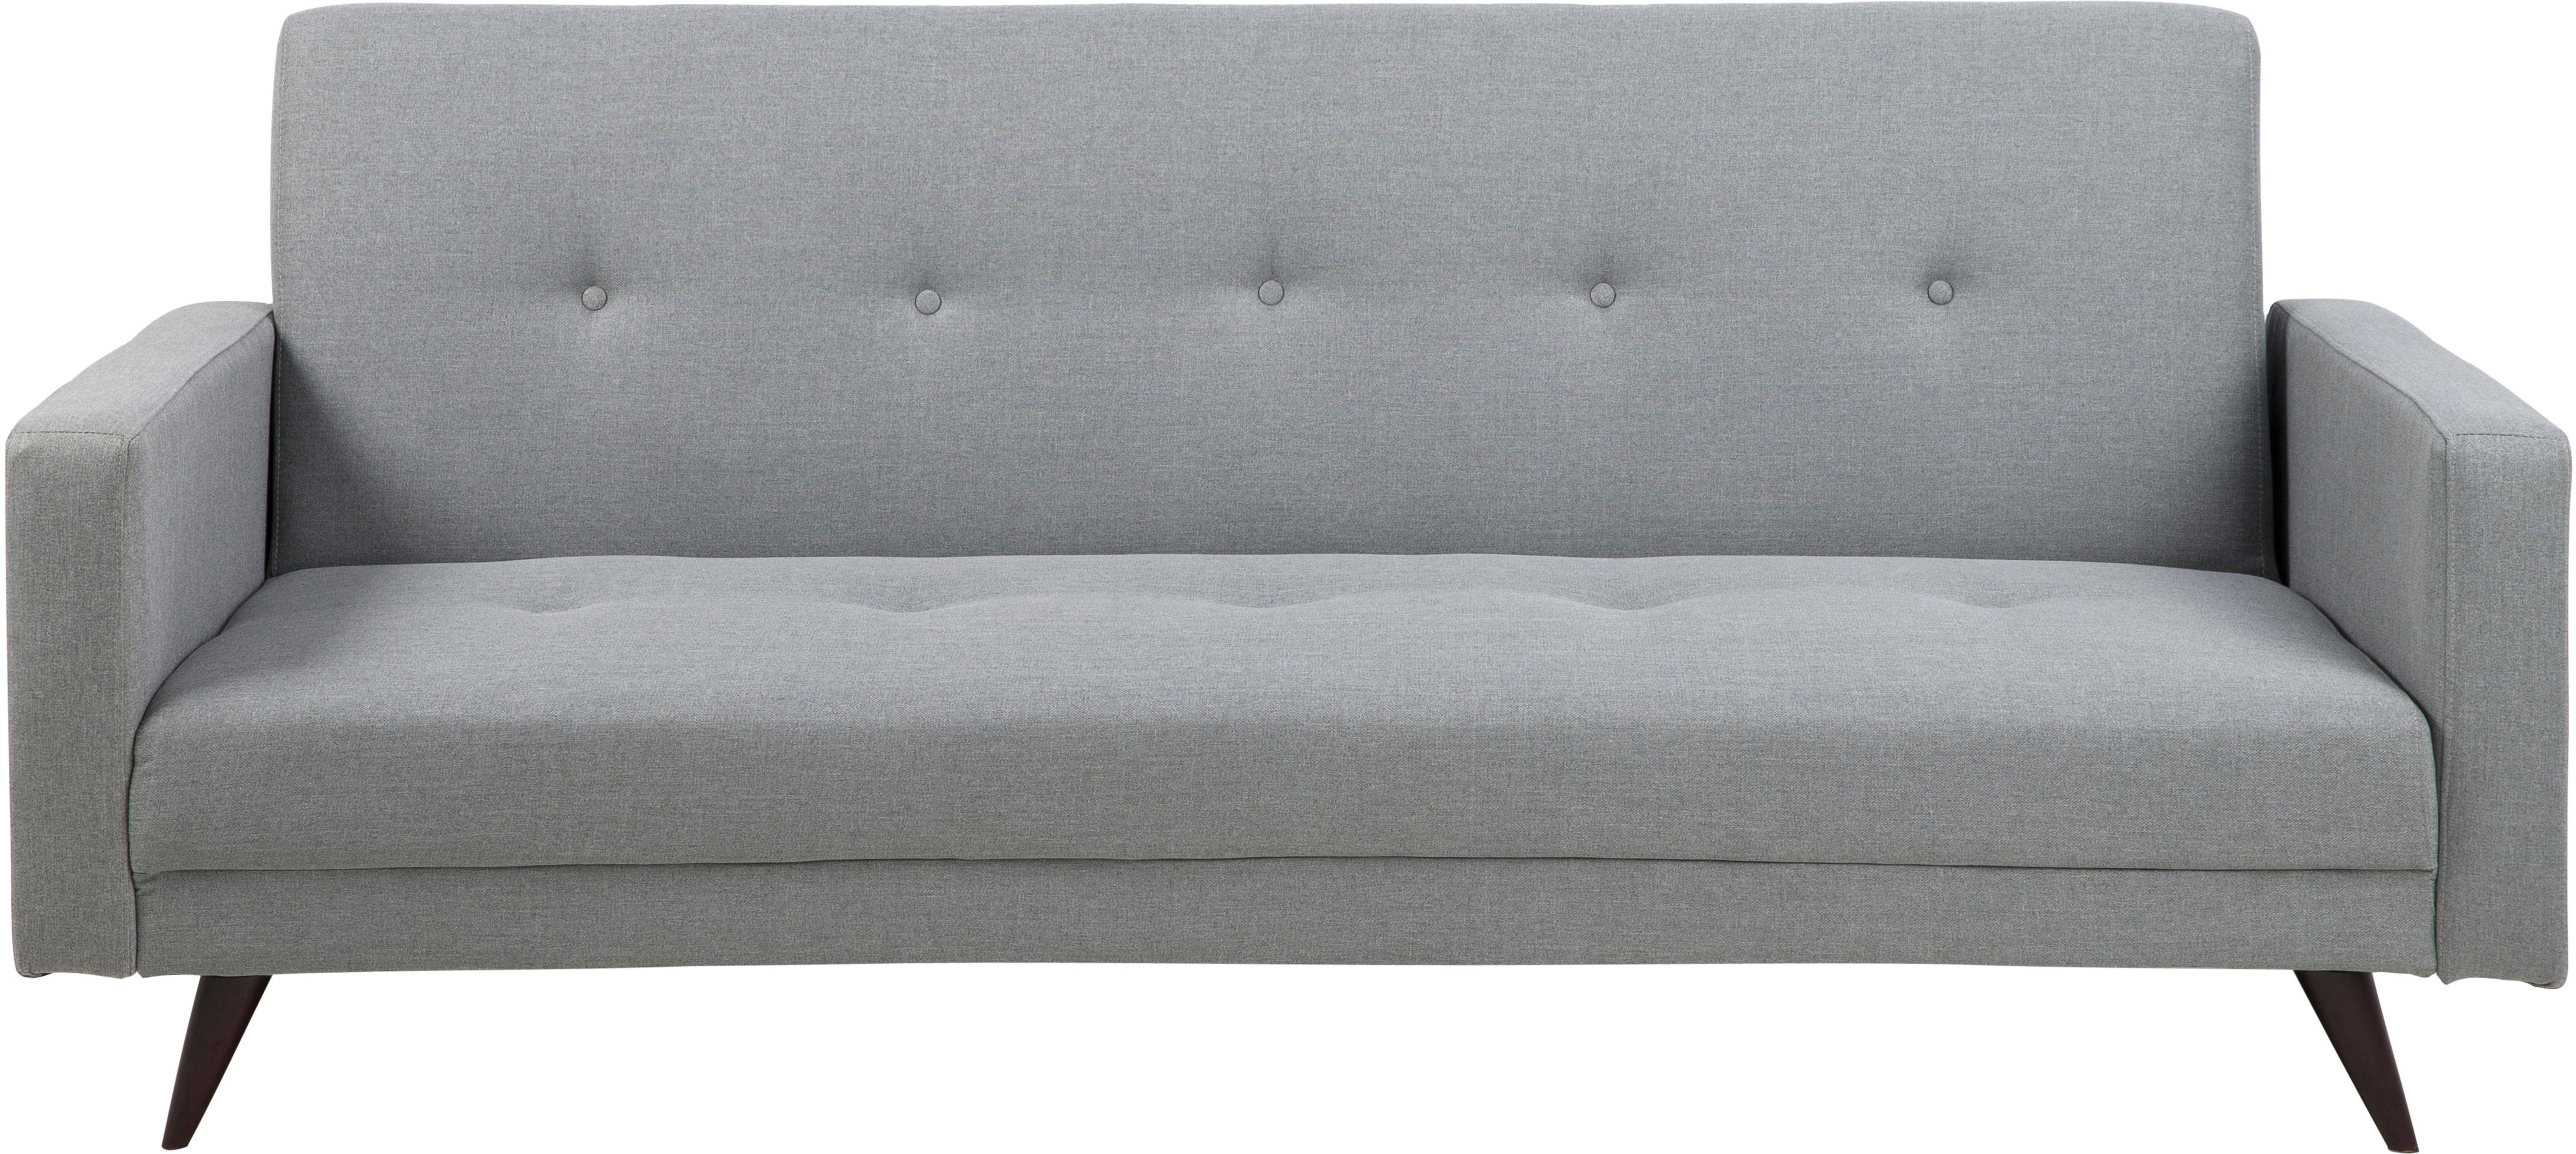 Schlafsofa Leconi (3-Sitzer), Bezug: Polyester Der hochwertige, Korpus: Sperrholz, Webstoff Hellgrau, B 217 x T 89 cm